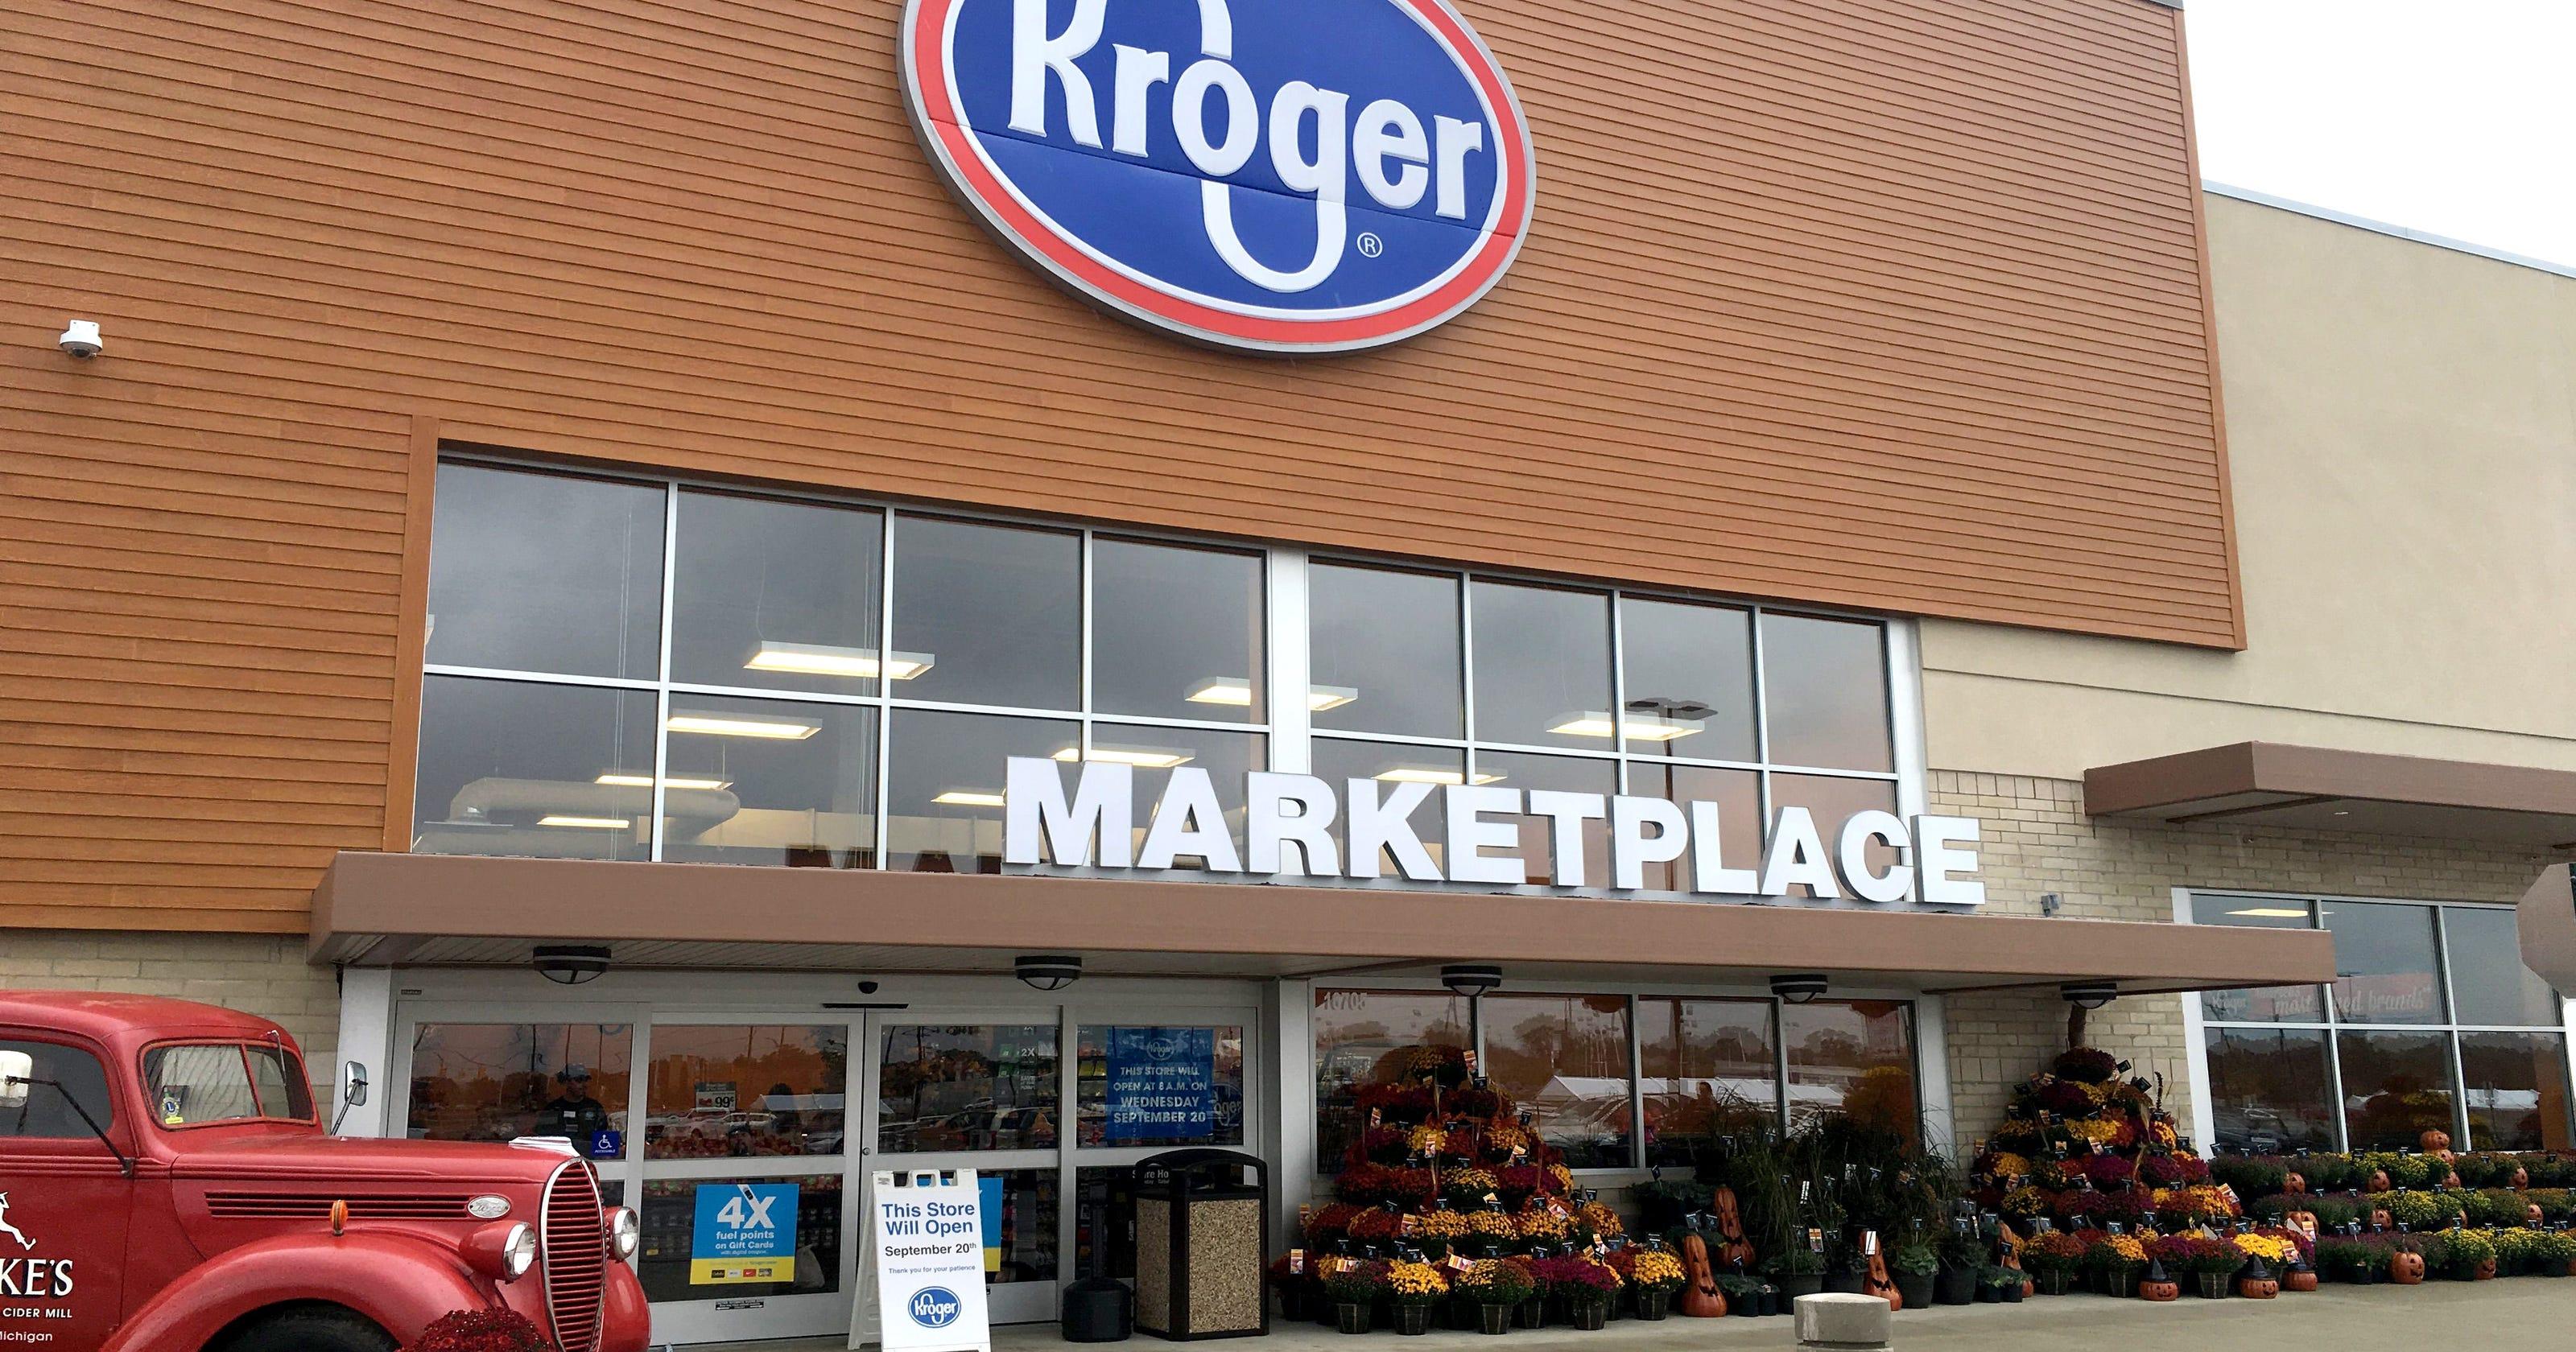 Kroger closing in Dearborn, chain to invest $97 million in Michigan